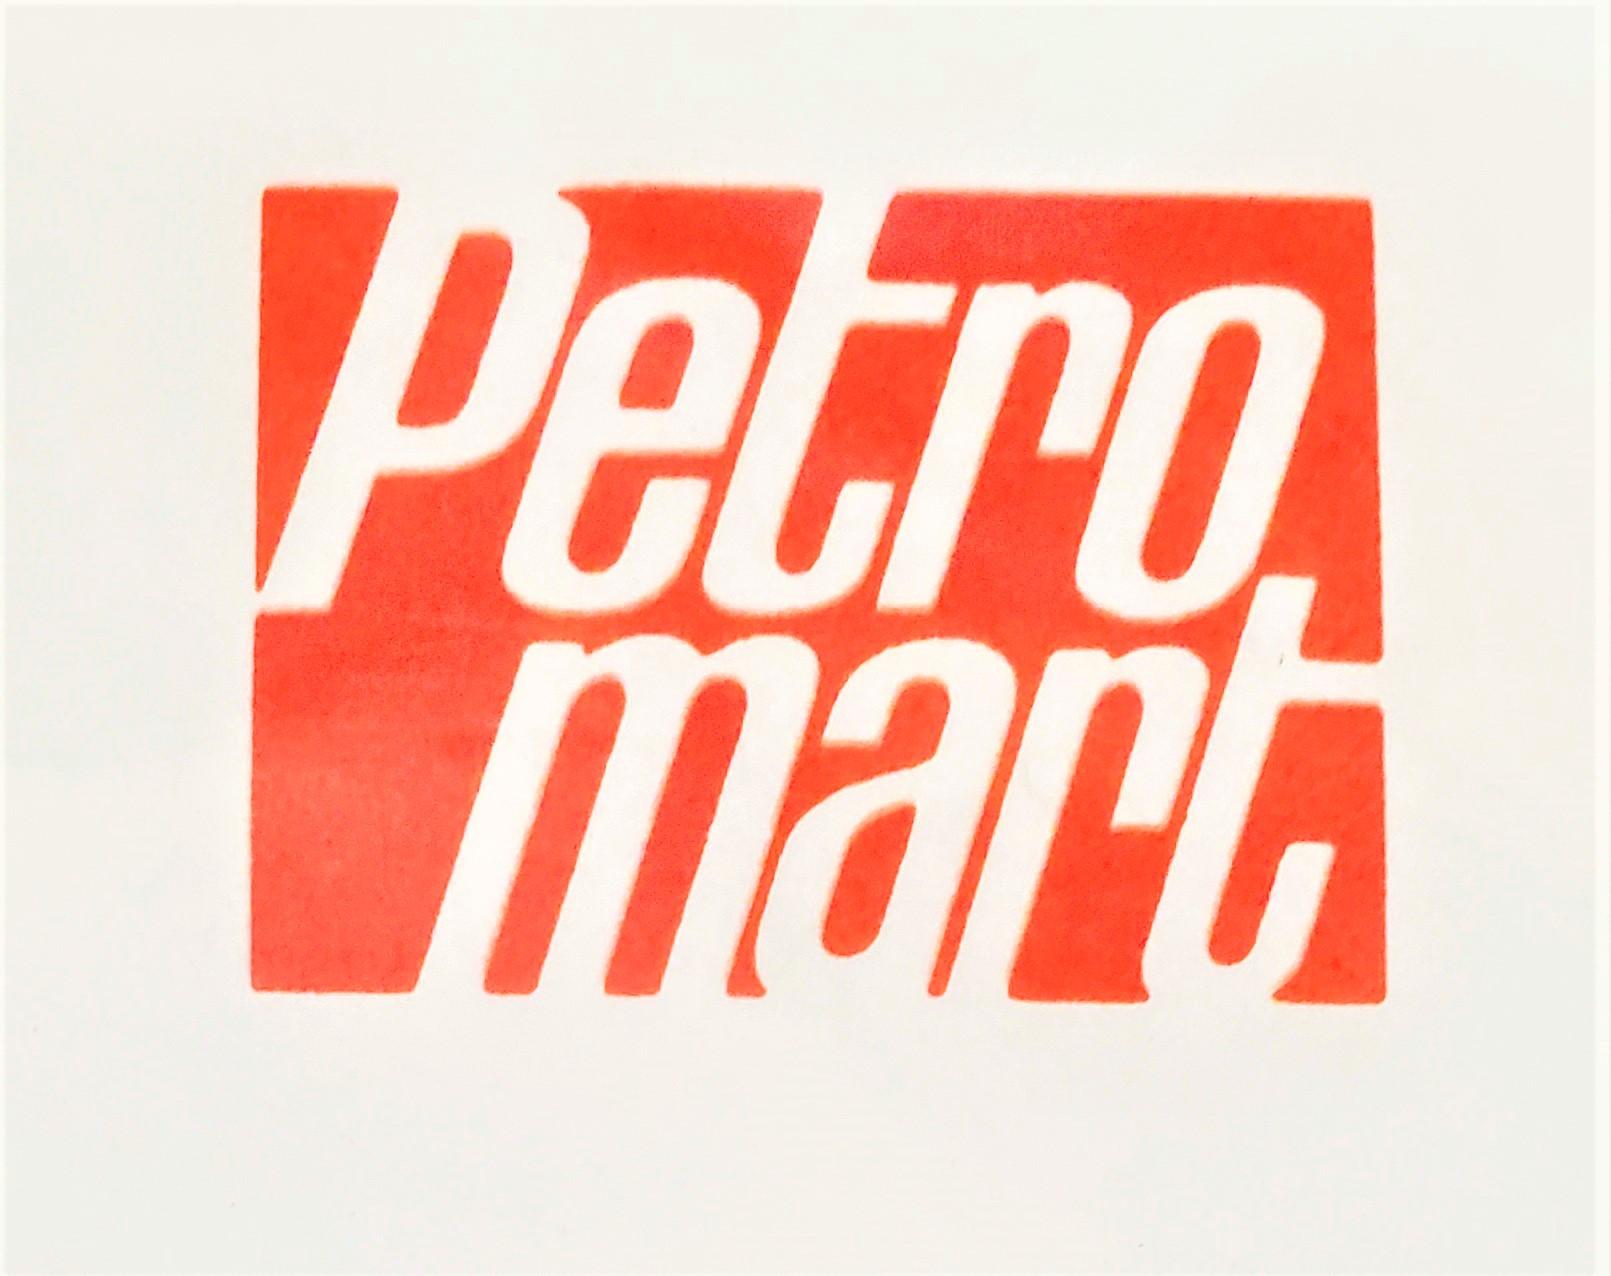 petromart